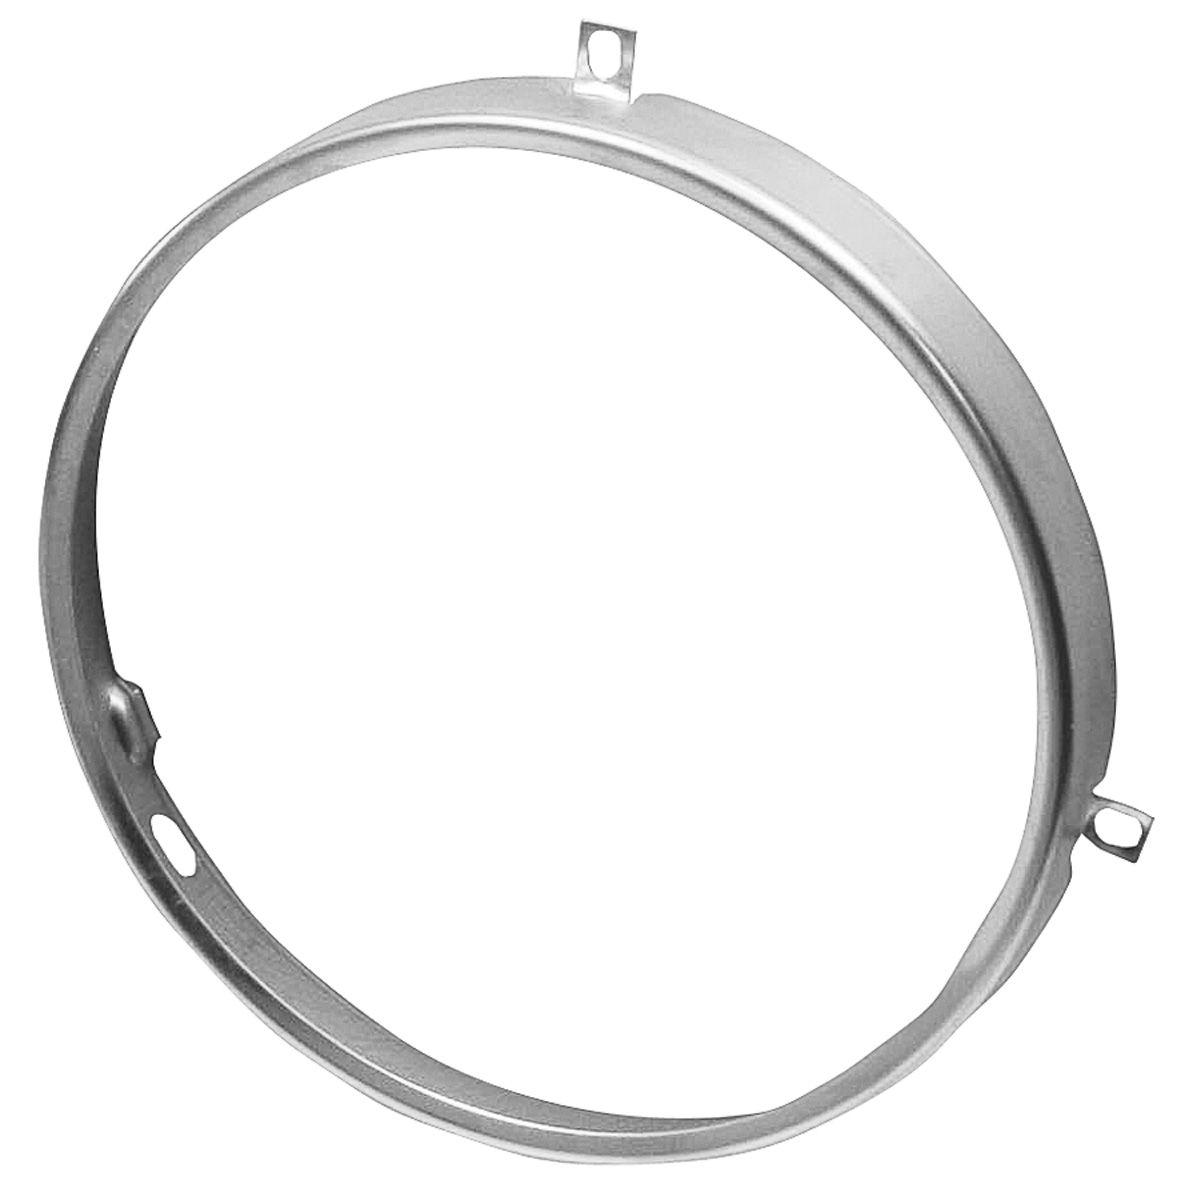 headl retaining ring restoparts 1985 Chevy El Camino headl retaining ring click to enlarge